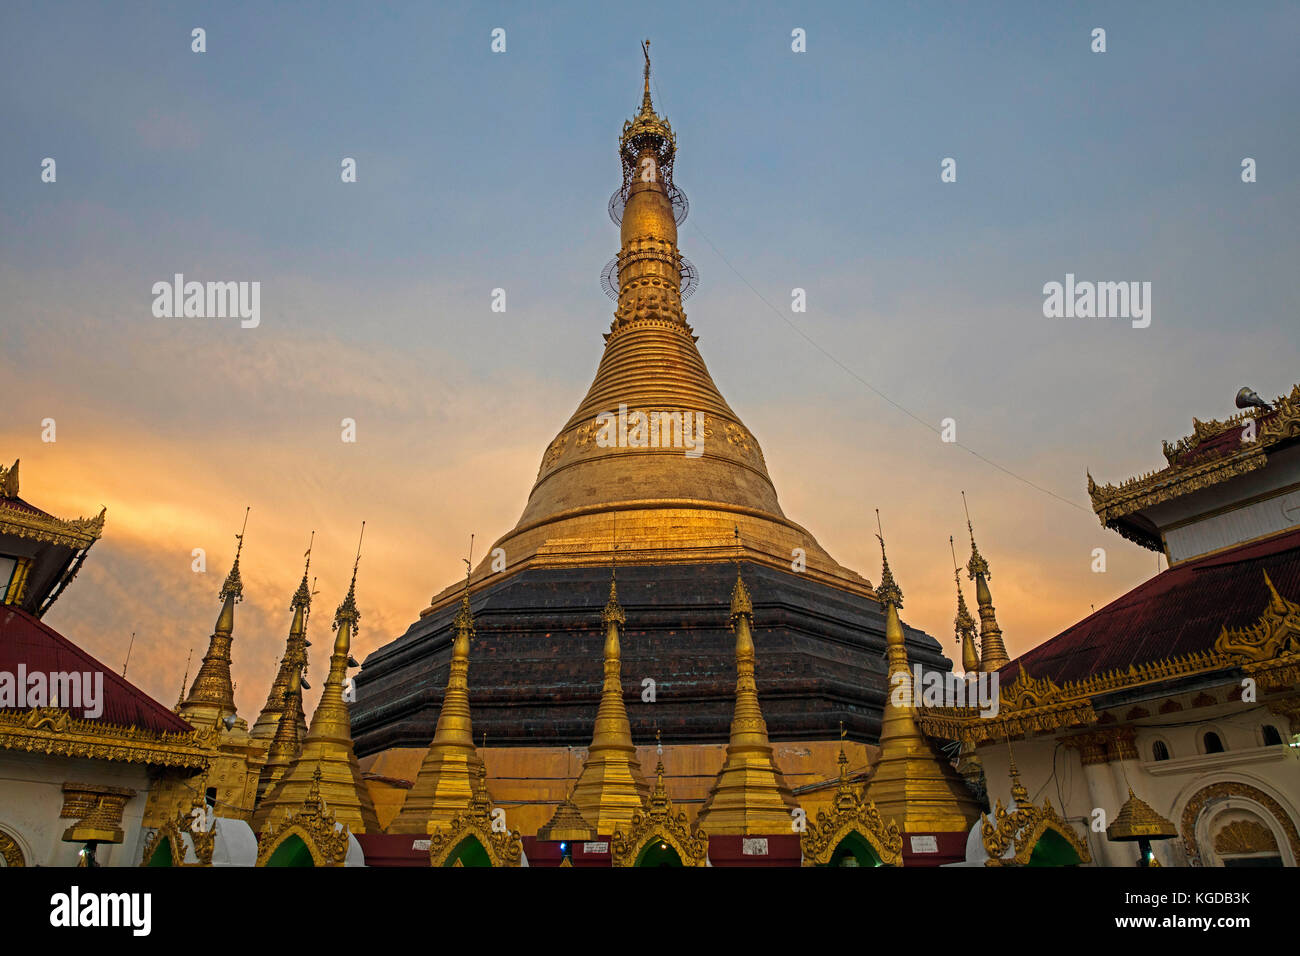 Kyaik de lan / pagoda kyaikthanlan / paya kyaikthanian templo y monasterio en mawlamyine / mawlamyaing, estado de Foto de stock